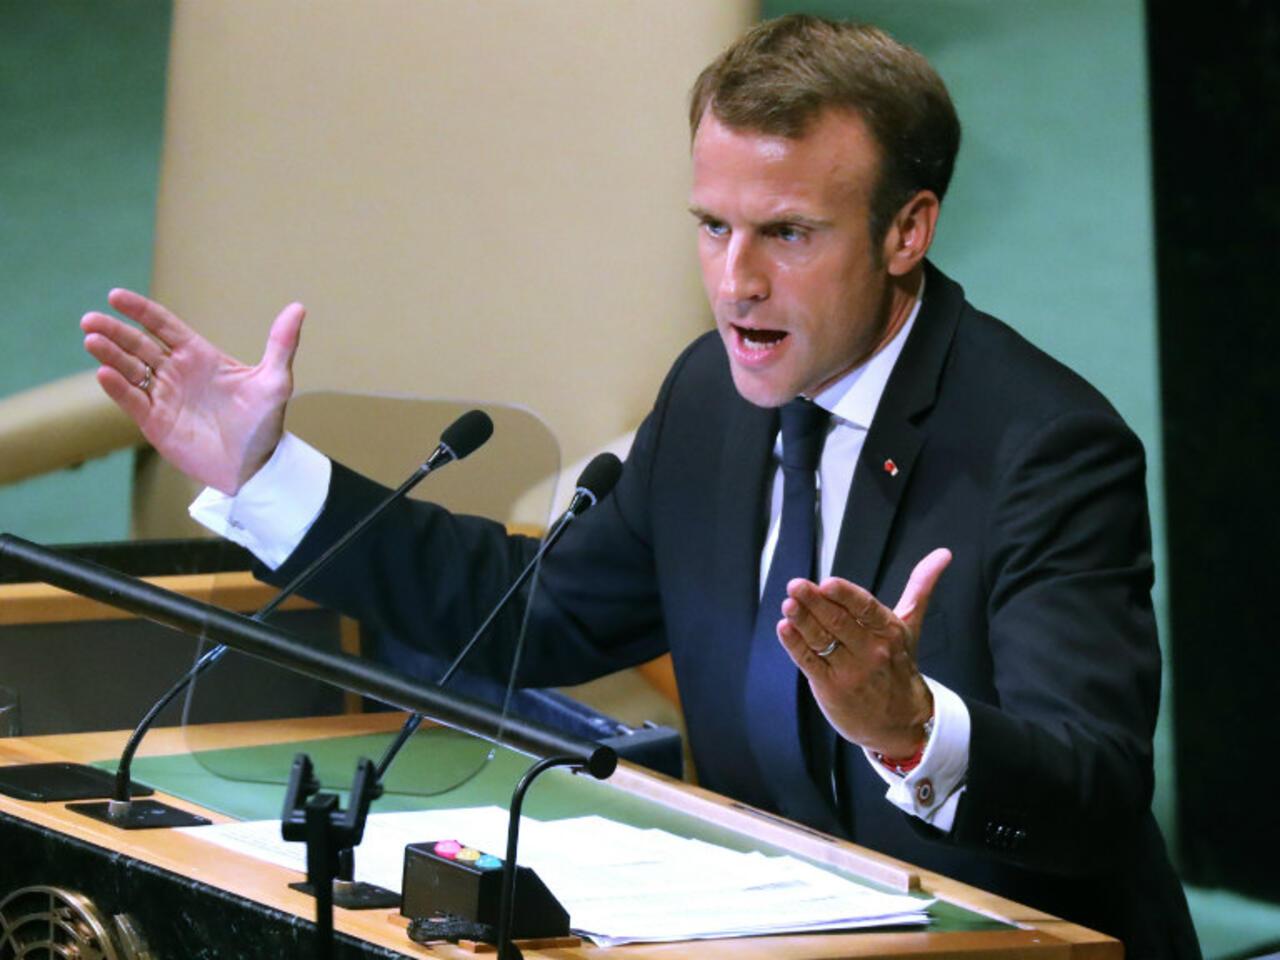 Macron Calls For Multilateralism In Rebuttal To Trump S Isolationist Un Speech